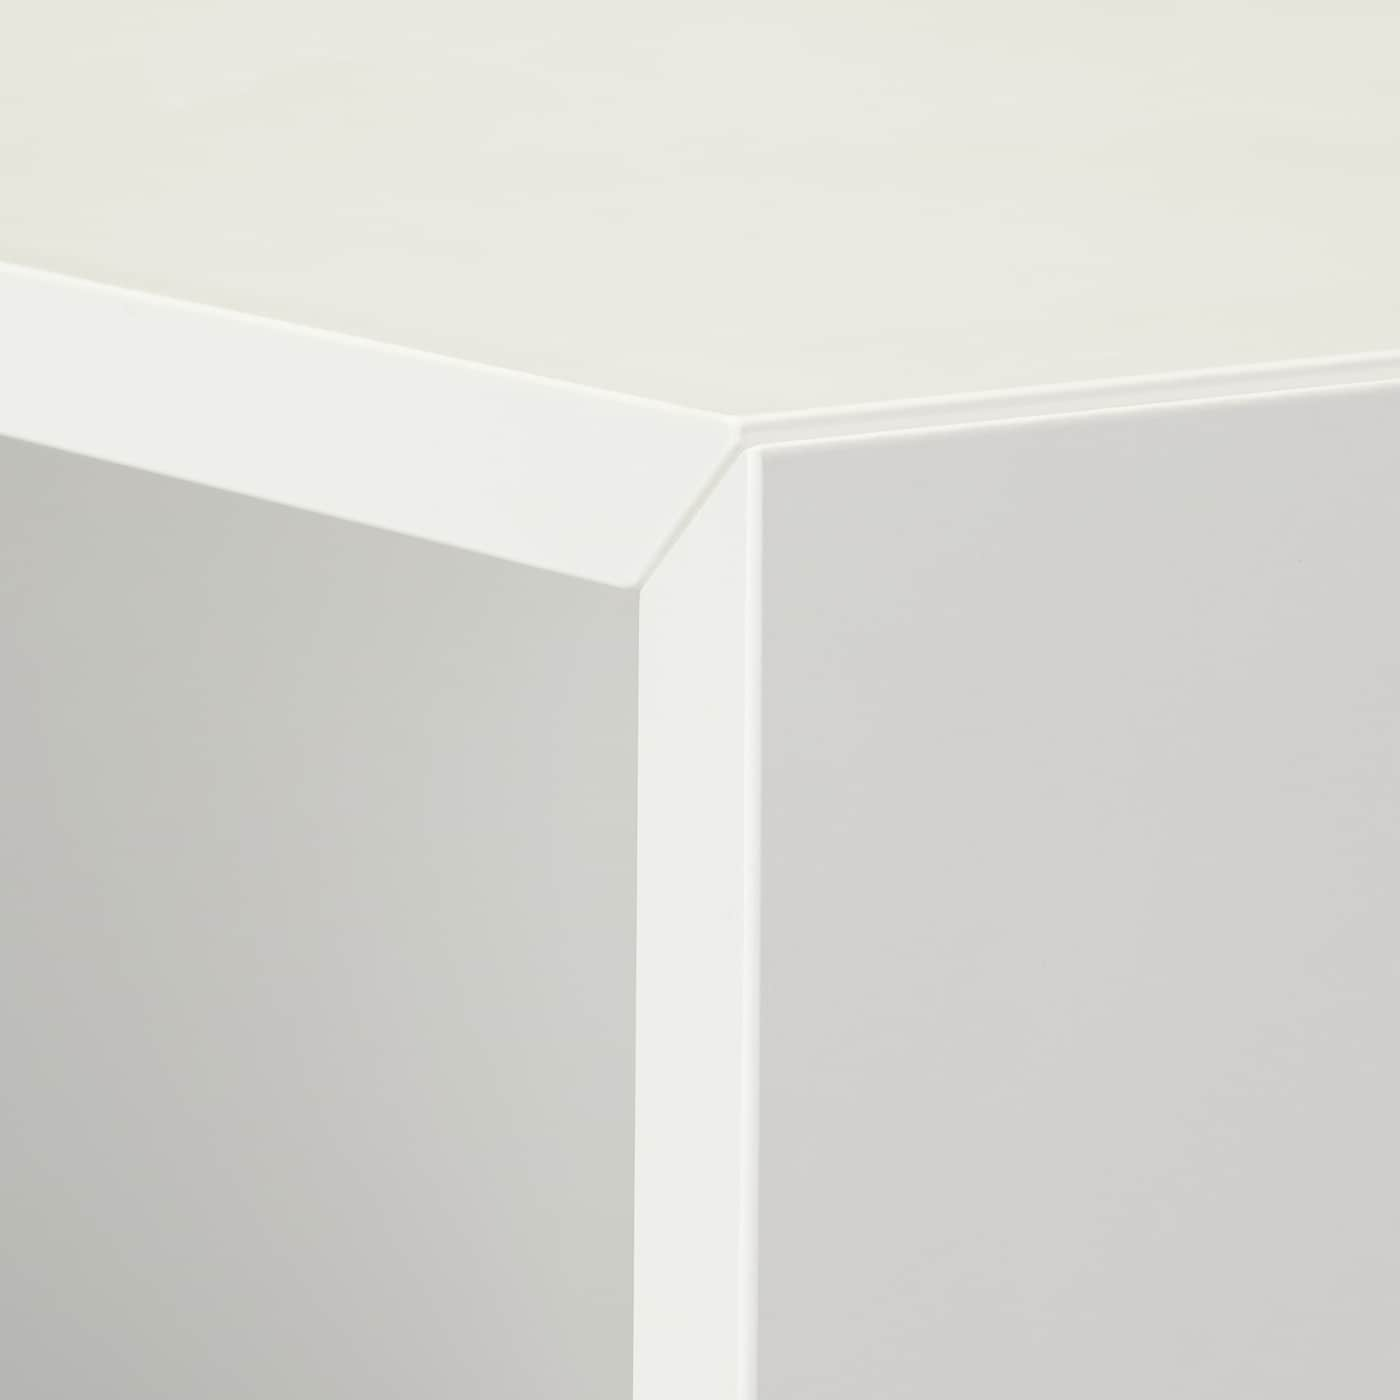 EKET エーケト キャビネット 4コンパートメント, ホワイト, 70x35x70 cm